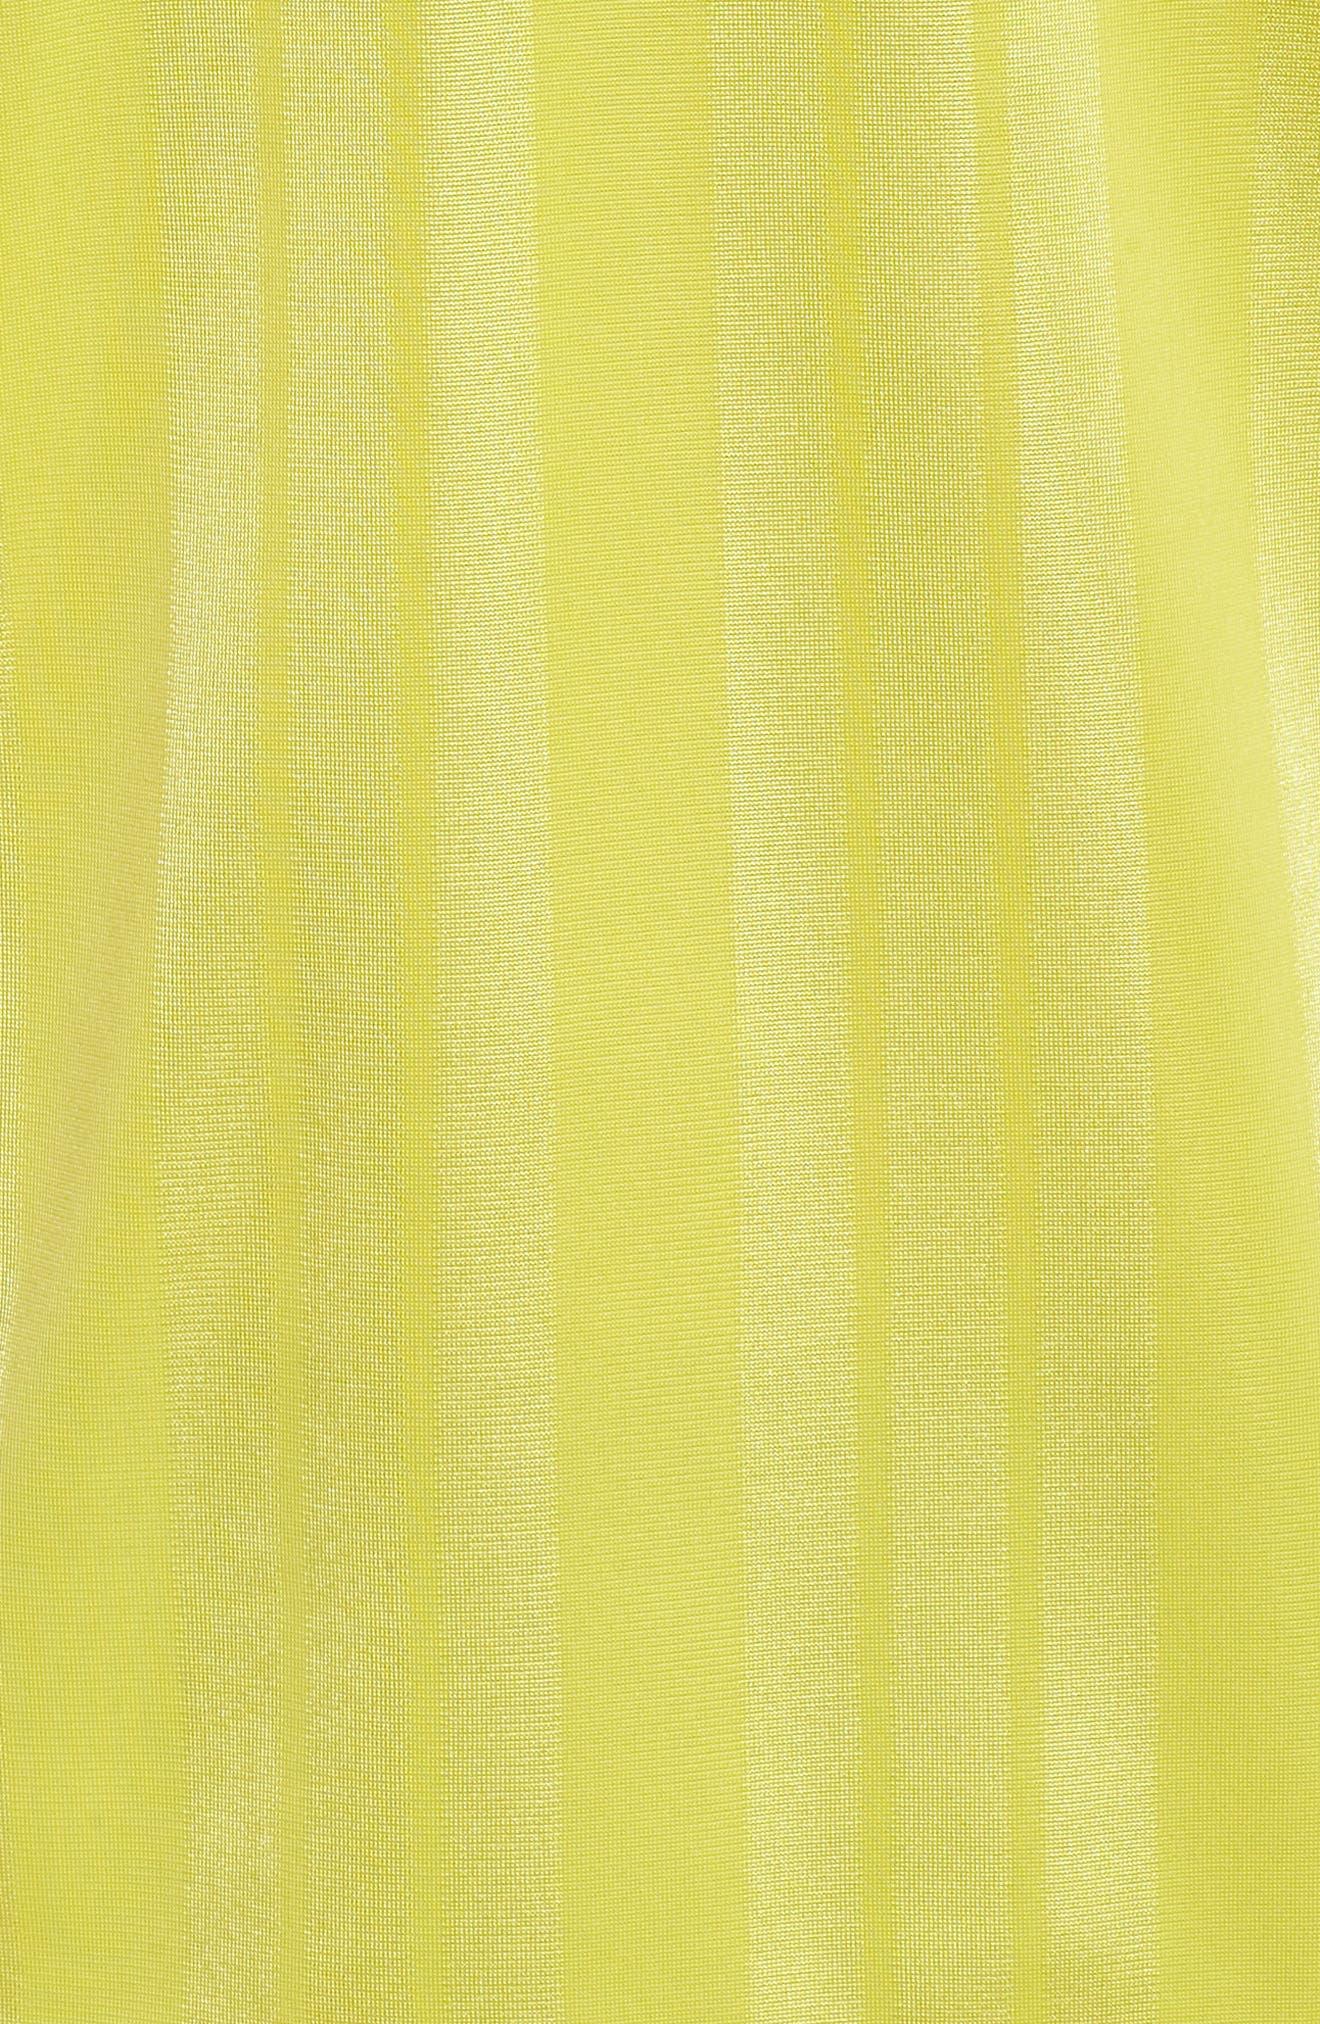 Originals Fashion League Jersey Tee,                             Alternate thumbnail 5, color,                             Prime Yellow